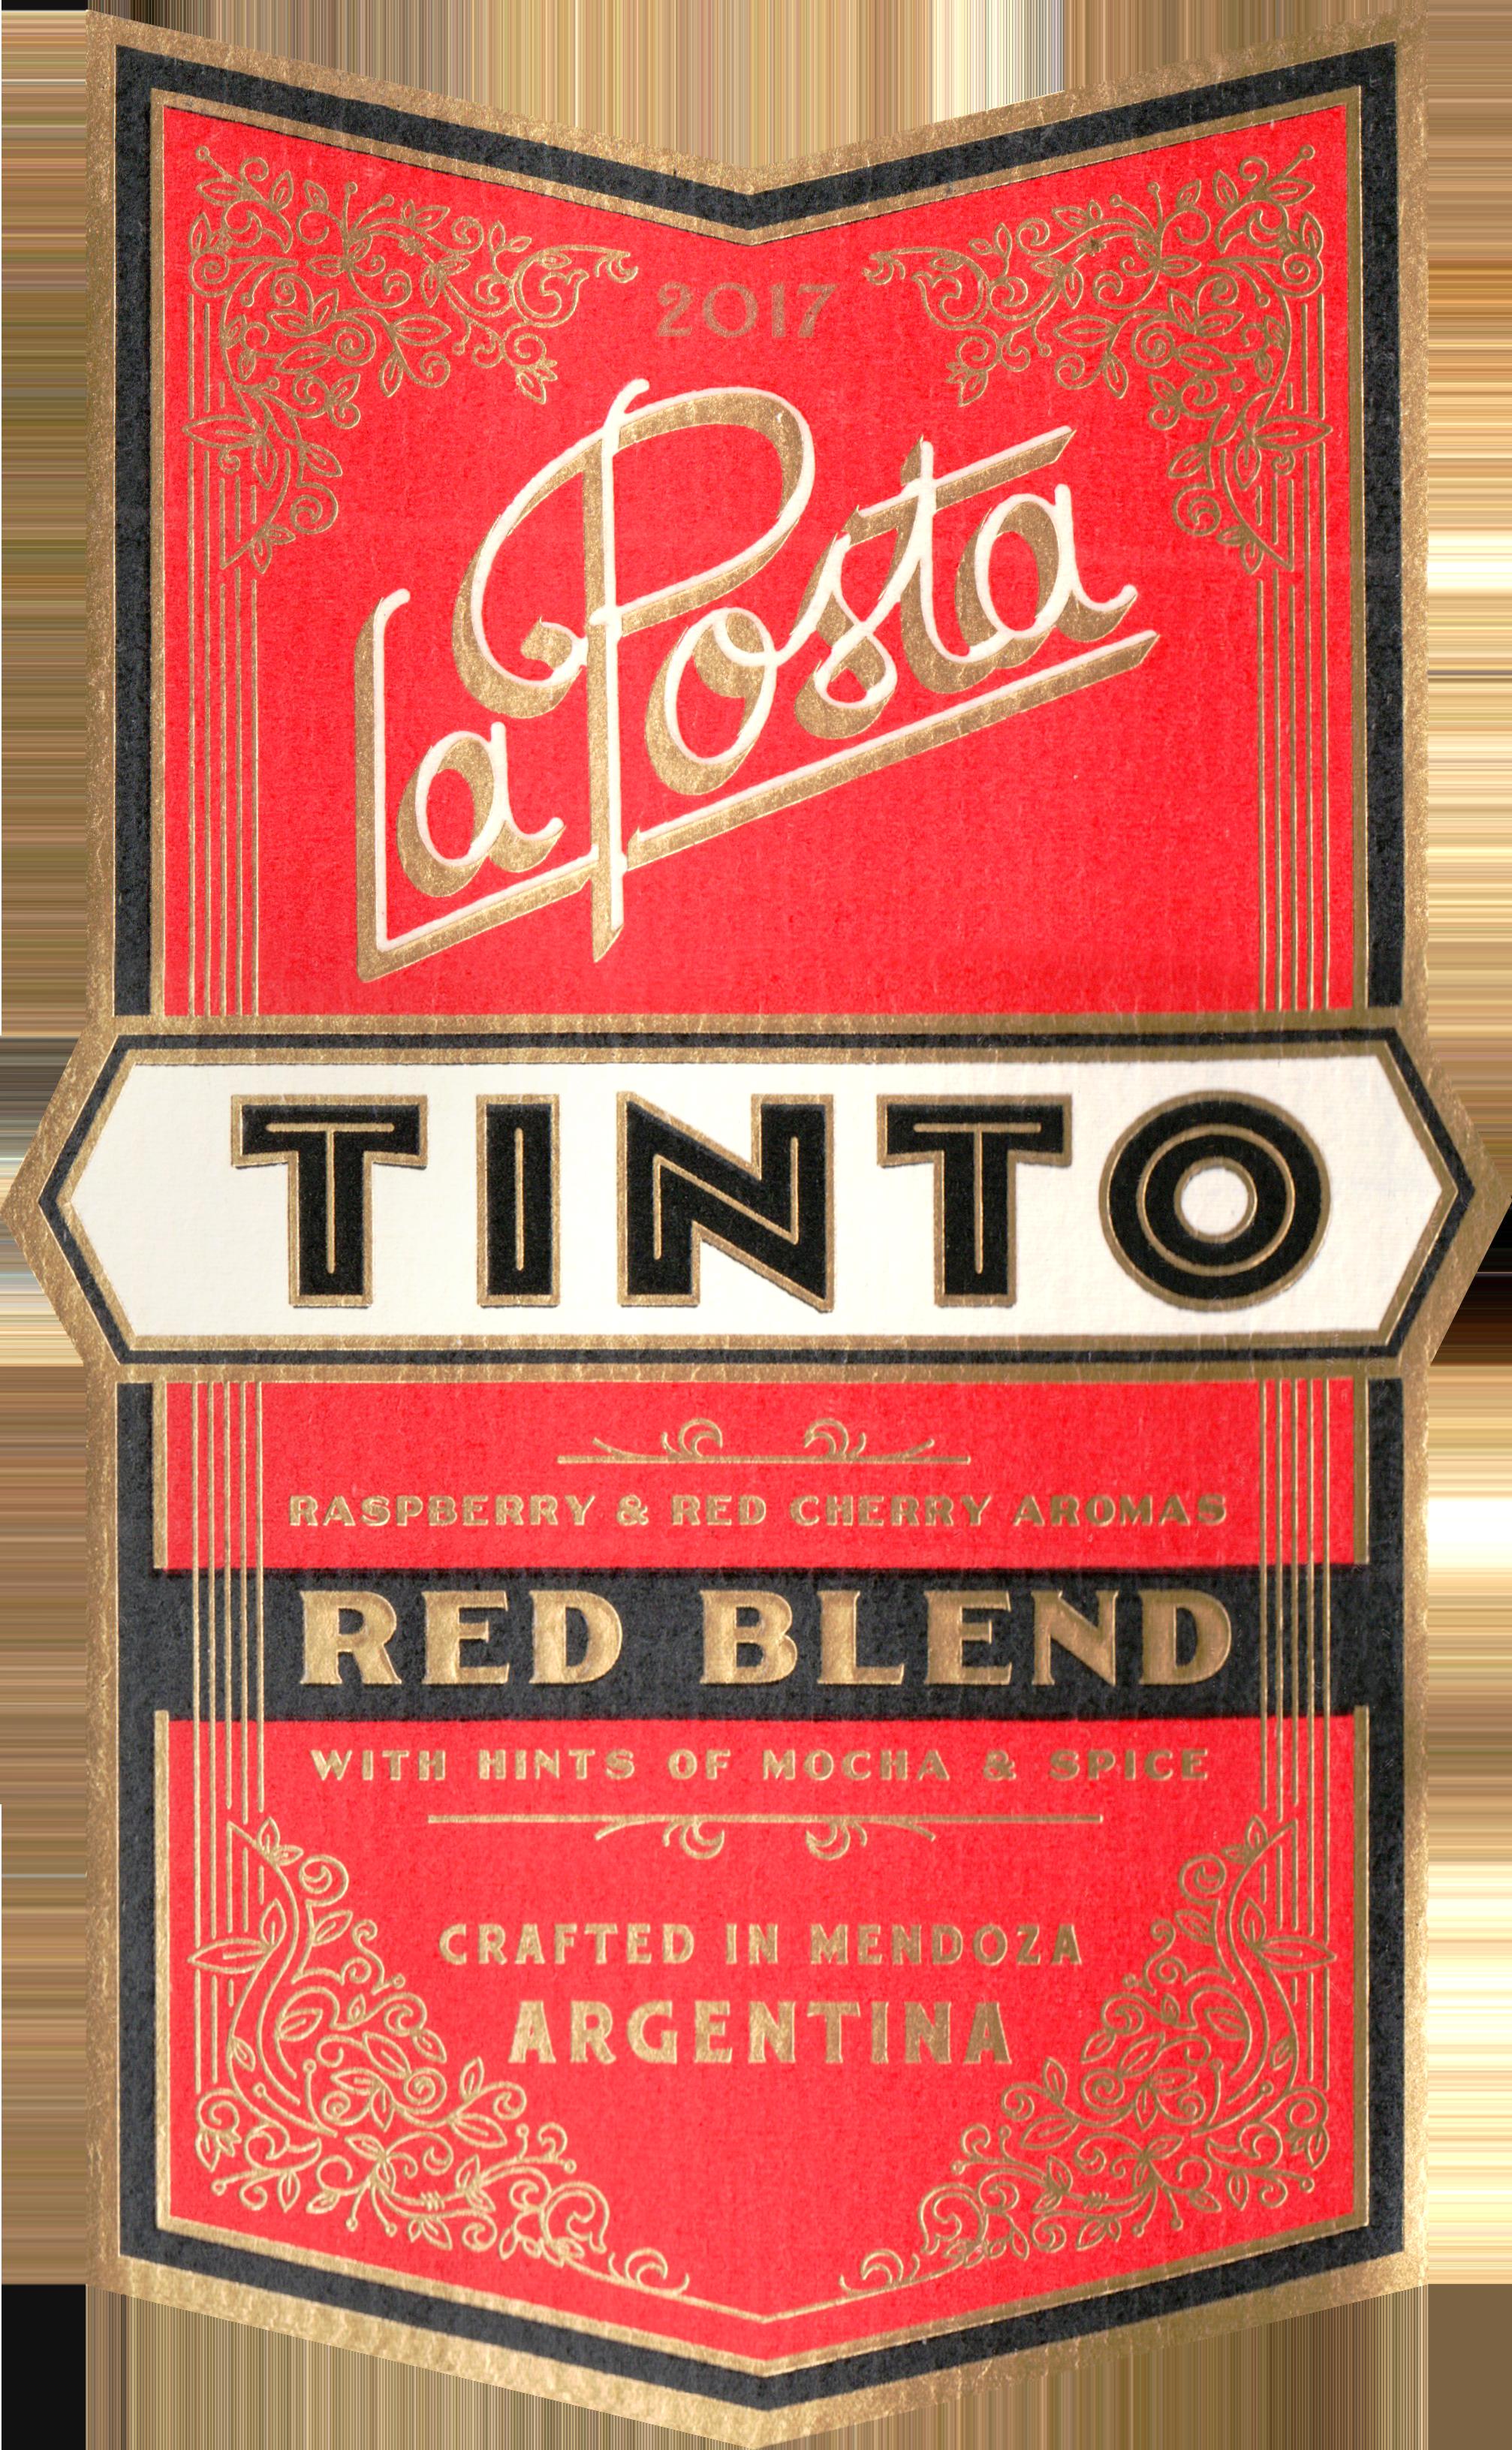 La Posta Tinto Red Blend 2017